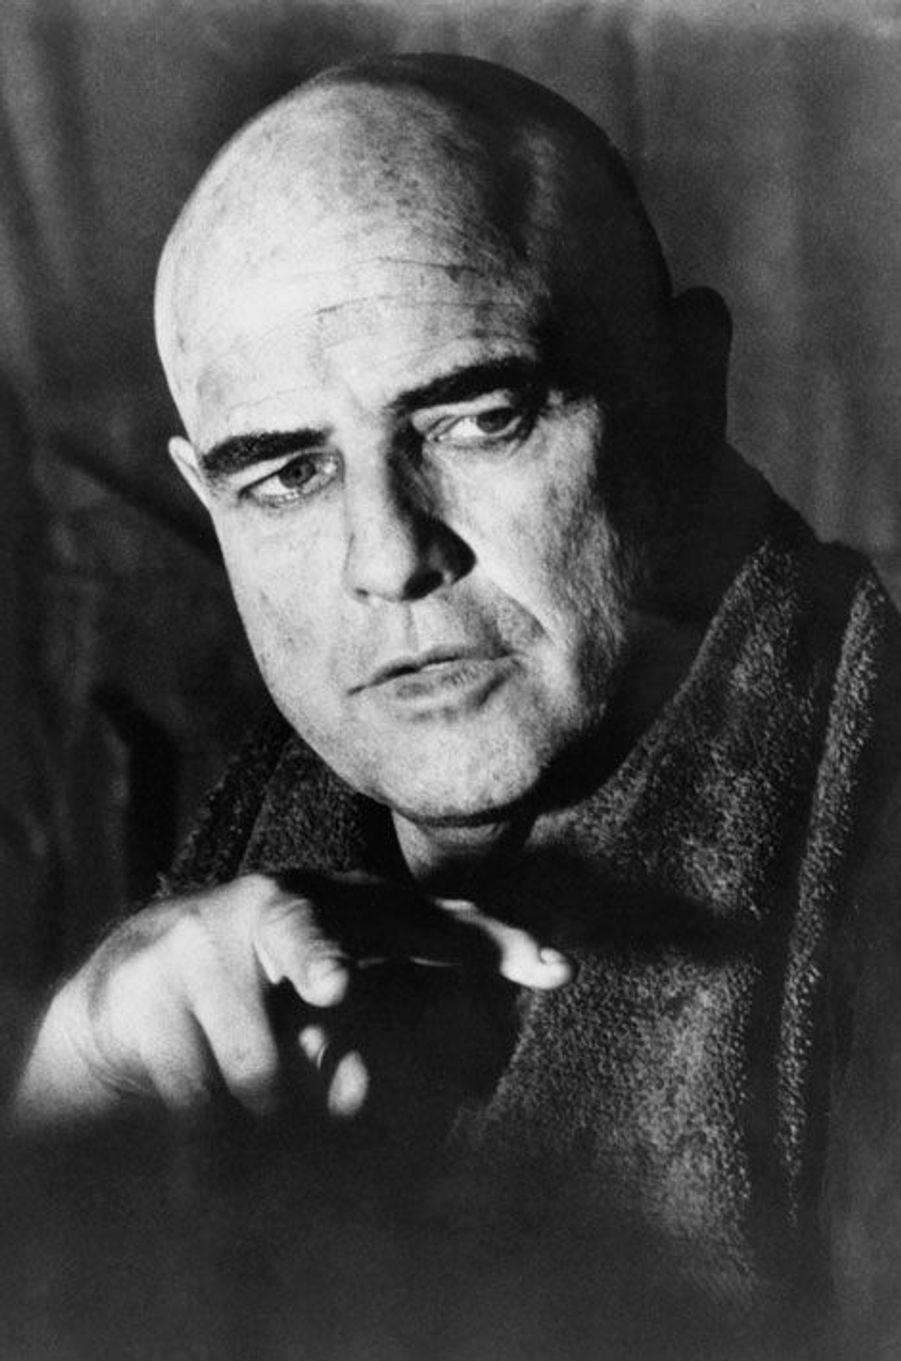 En 1979, Marlon Brando incarne le colonel Kurtz dans «Apocalypse Now» de Francis Ford Coppola.